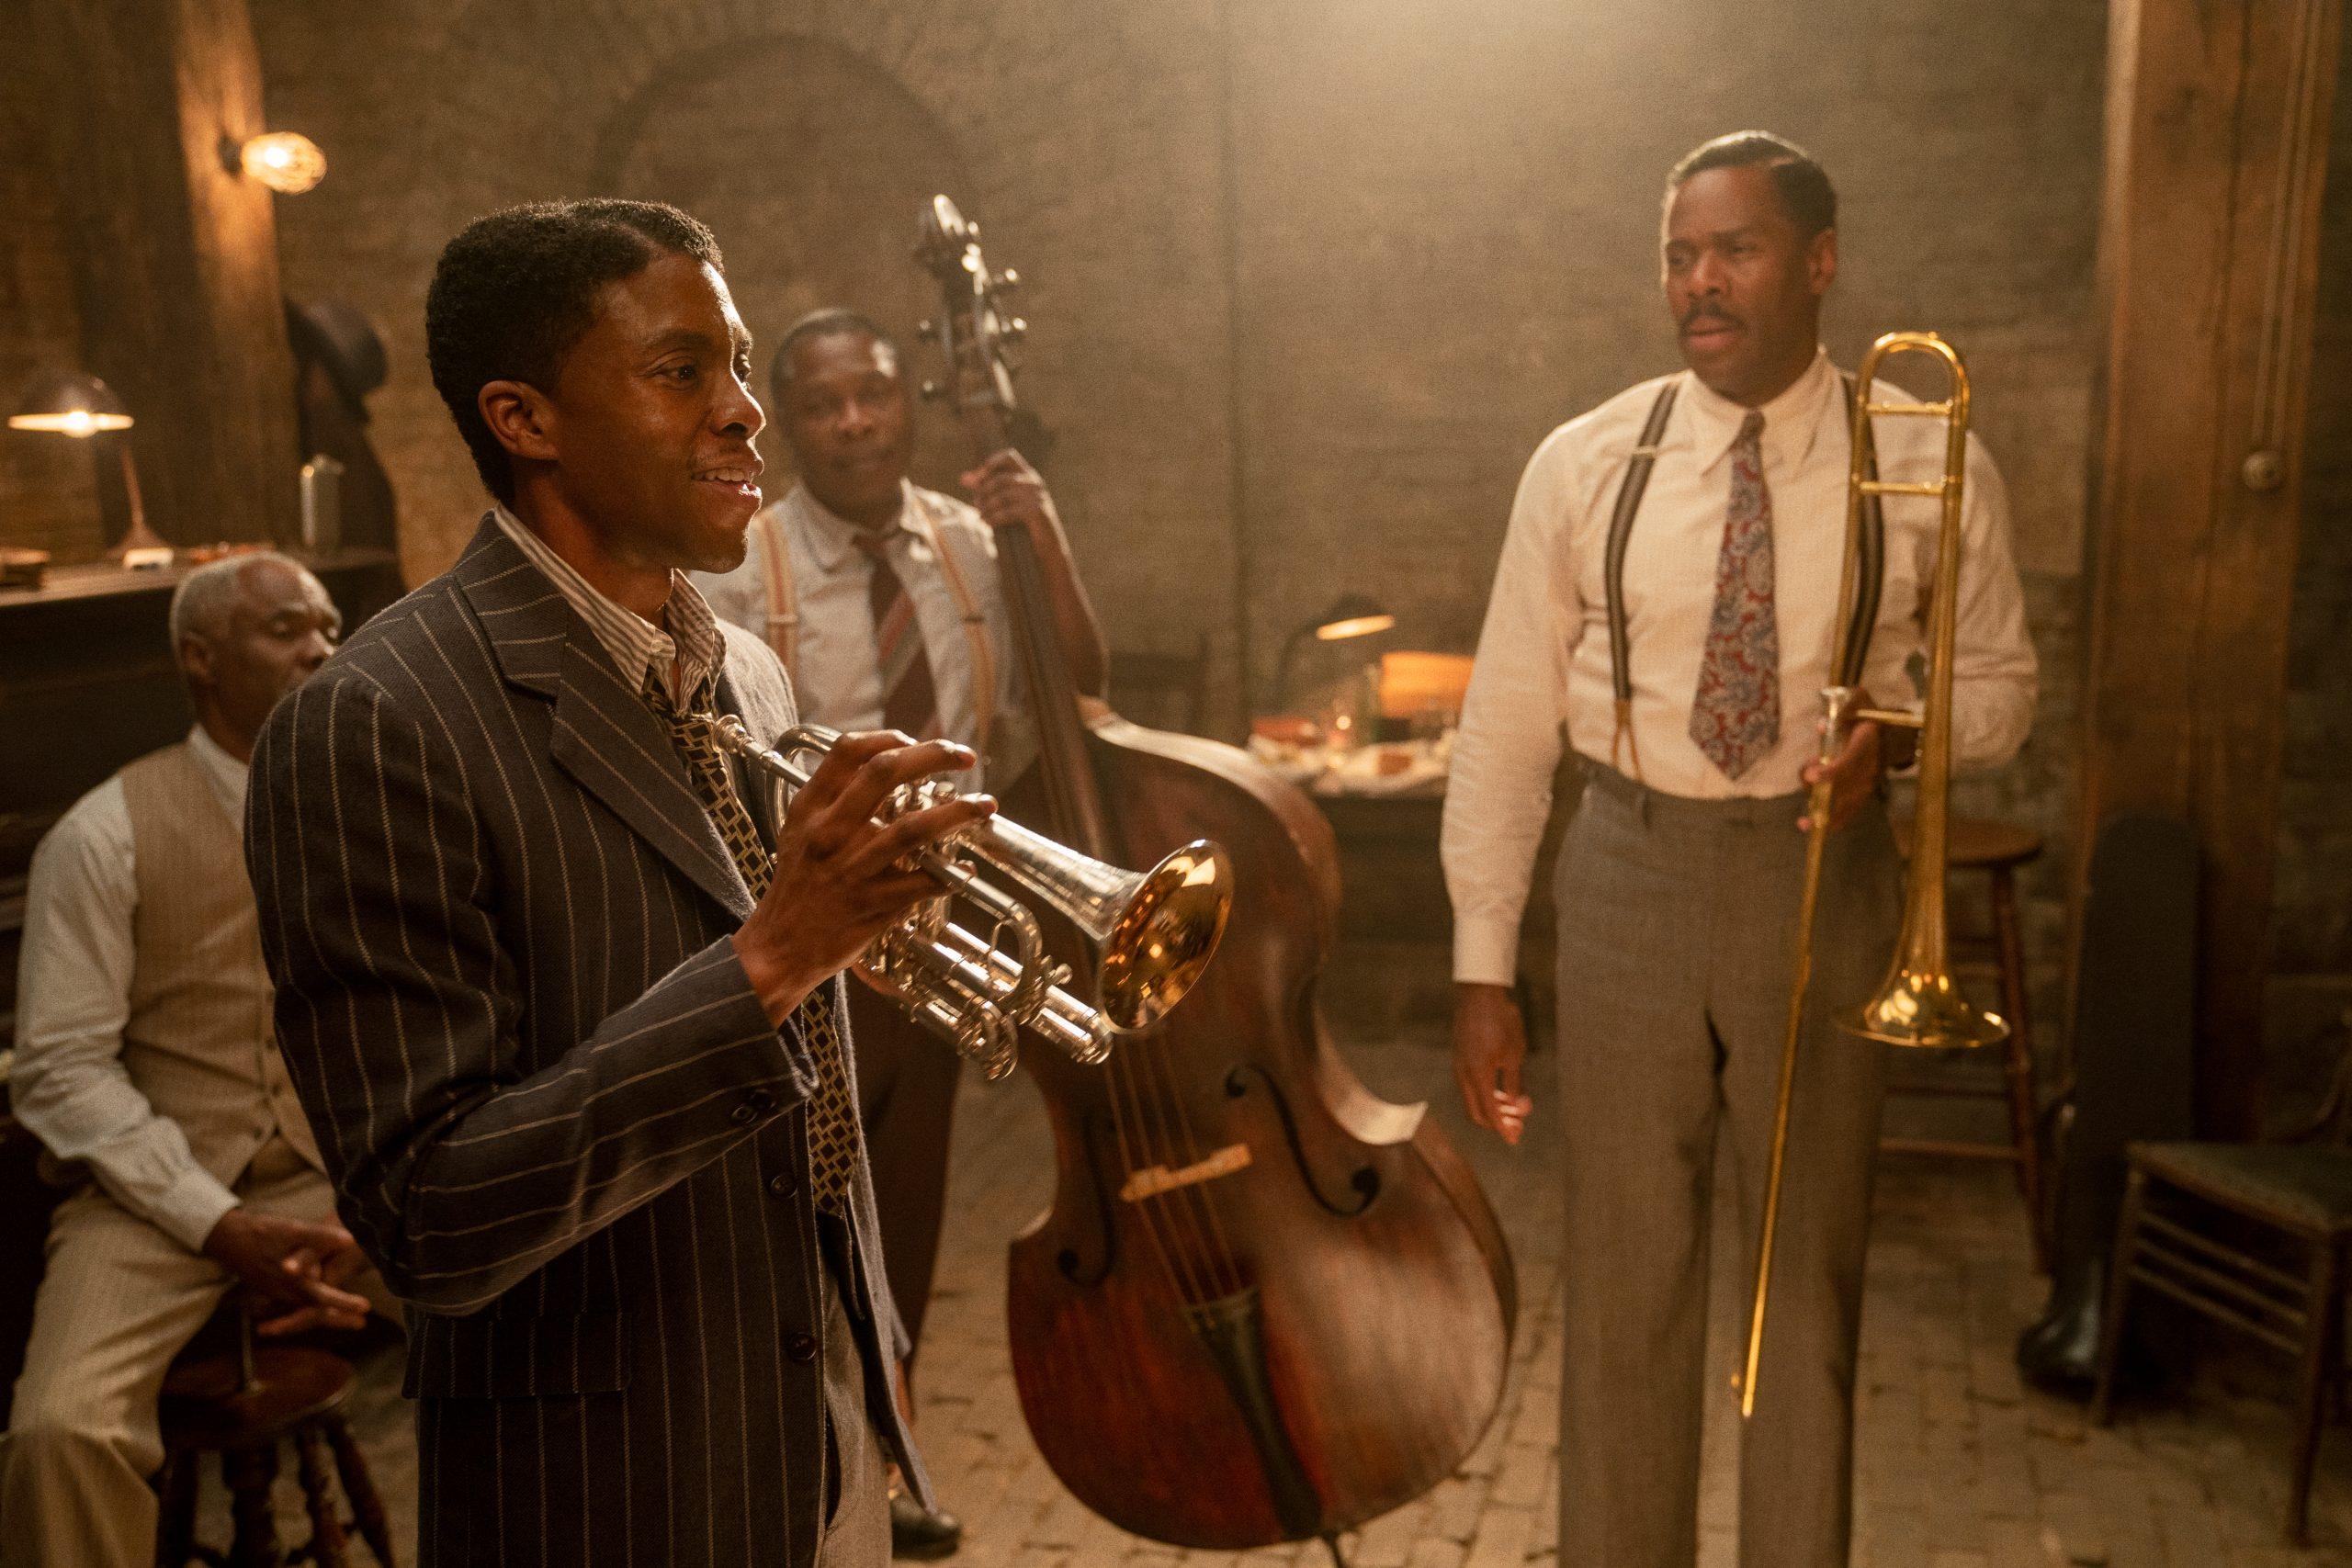 From left to right: Glynn Turman, Chadwick Boseman, Michael Potts, and Colman Domingo in 'Ma Rainey's Black Bottom' on Netflix. (David Lee / Netflix)